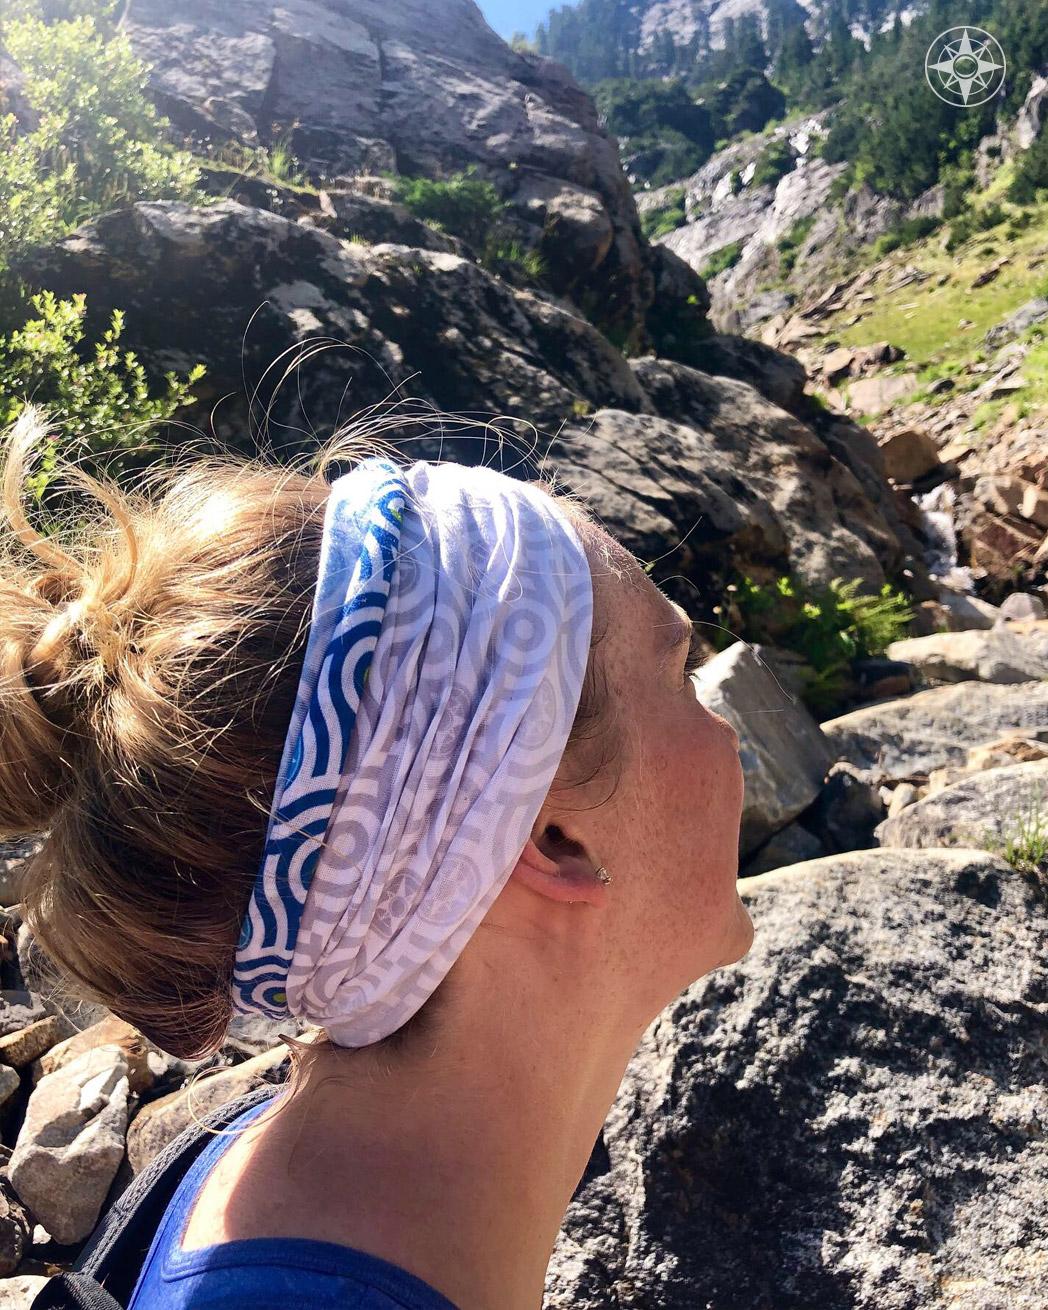 Versatile Happier Bandana worn here as a headband on a Washington trail. #HappierPlace #hikinggear outdoor outfit women\'s fashion #outdoorapparel